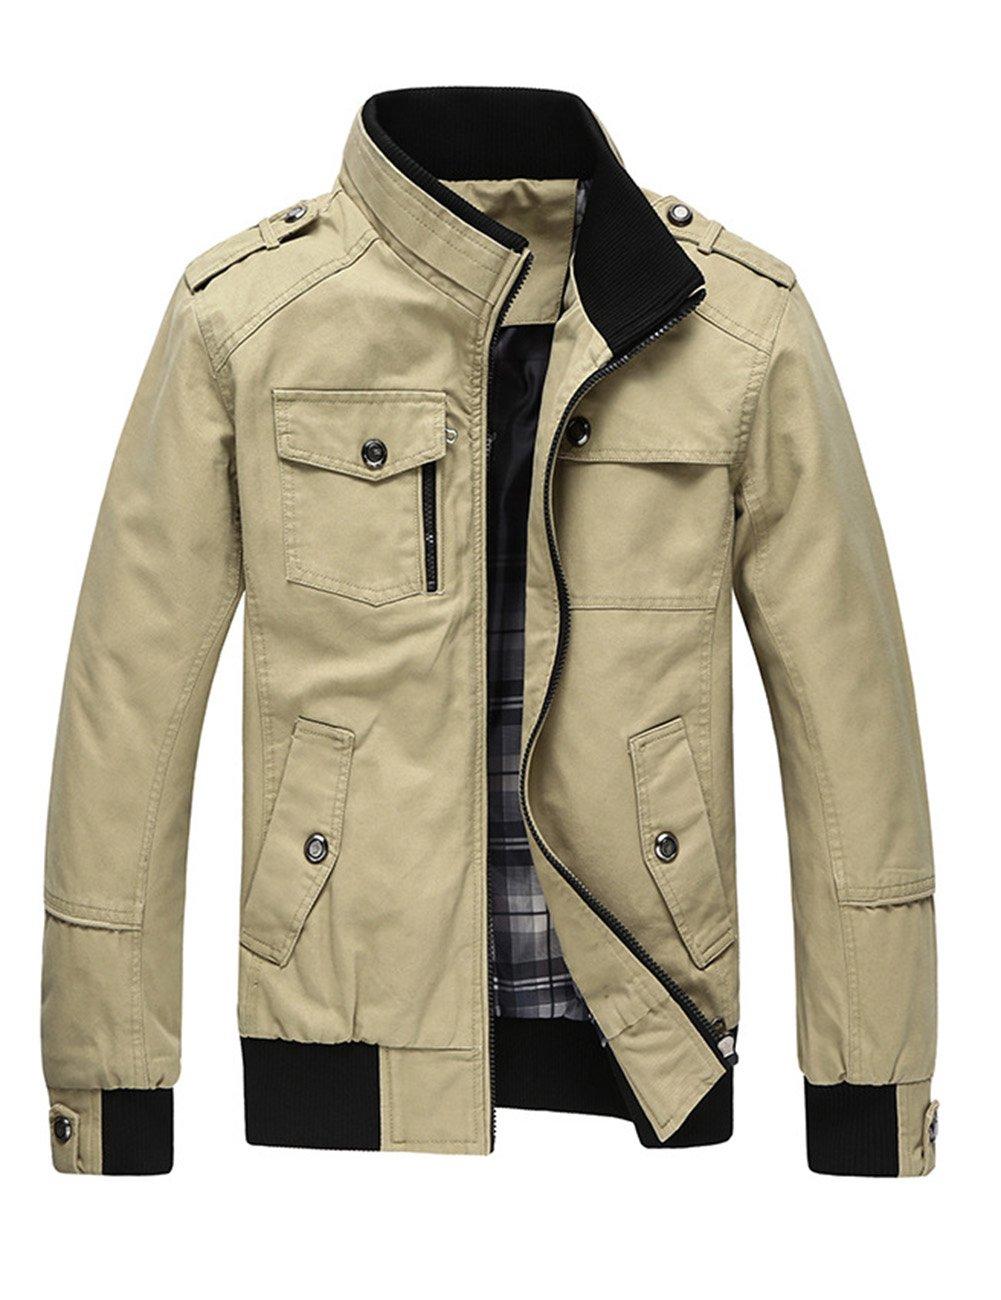 Autumn Men's Cotton Windbreake Jacket Fashion Coat with Zip Closure